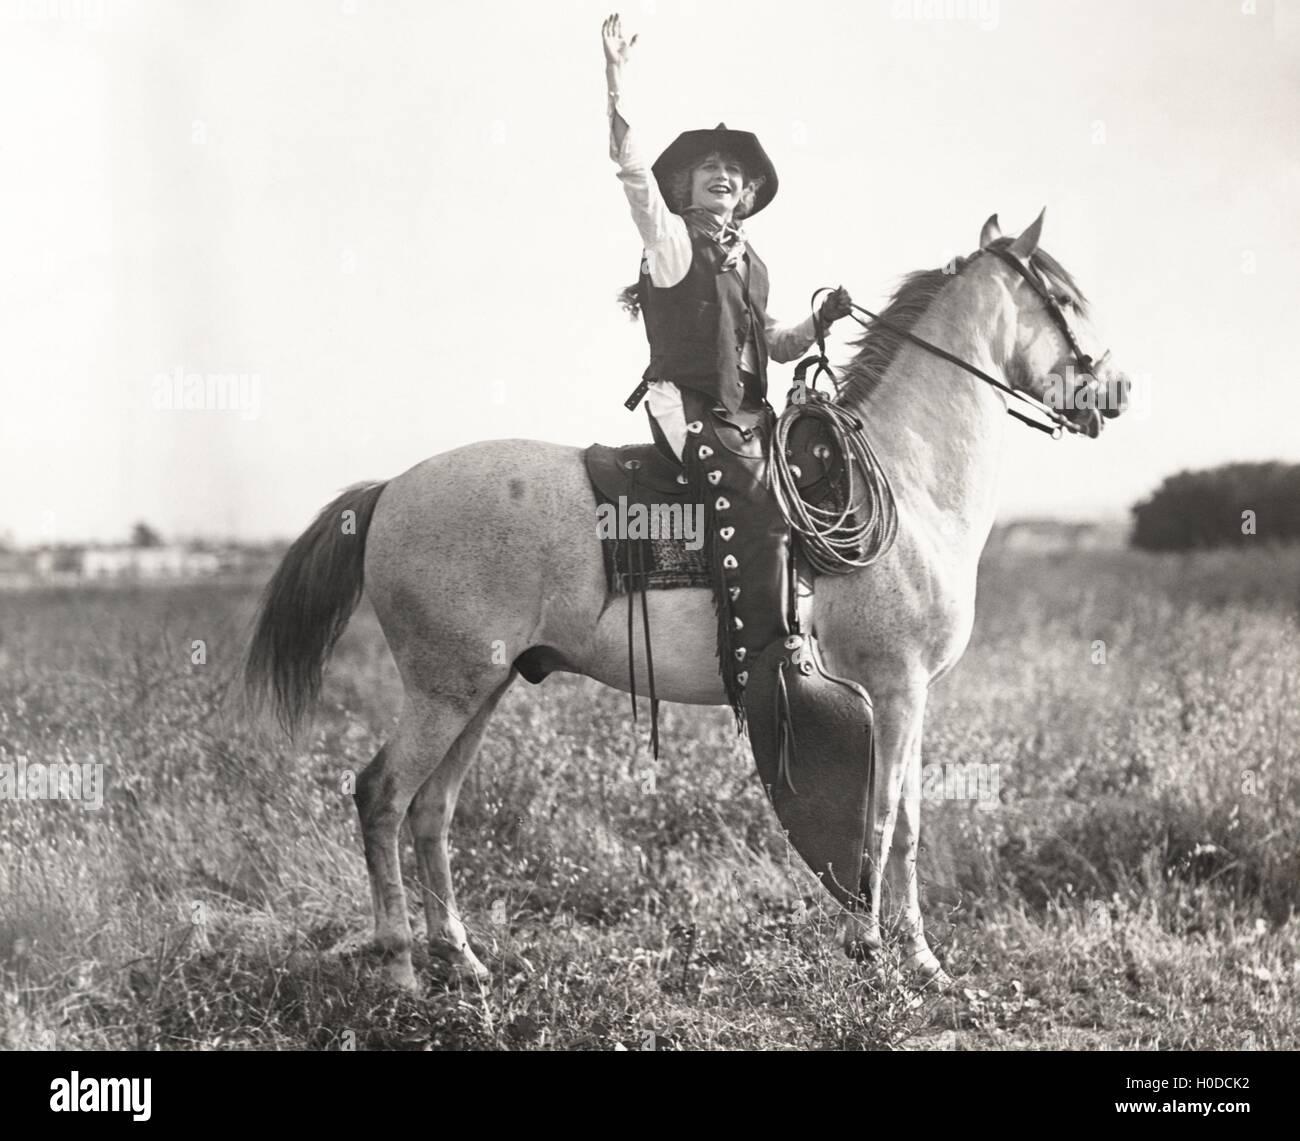 Howdy partner - Stock Image